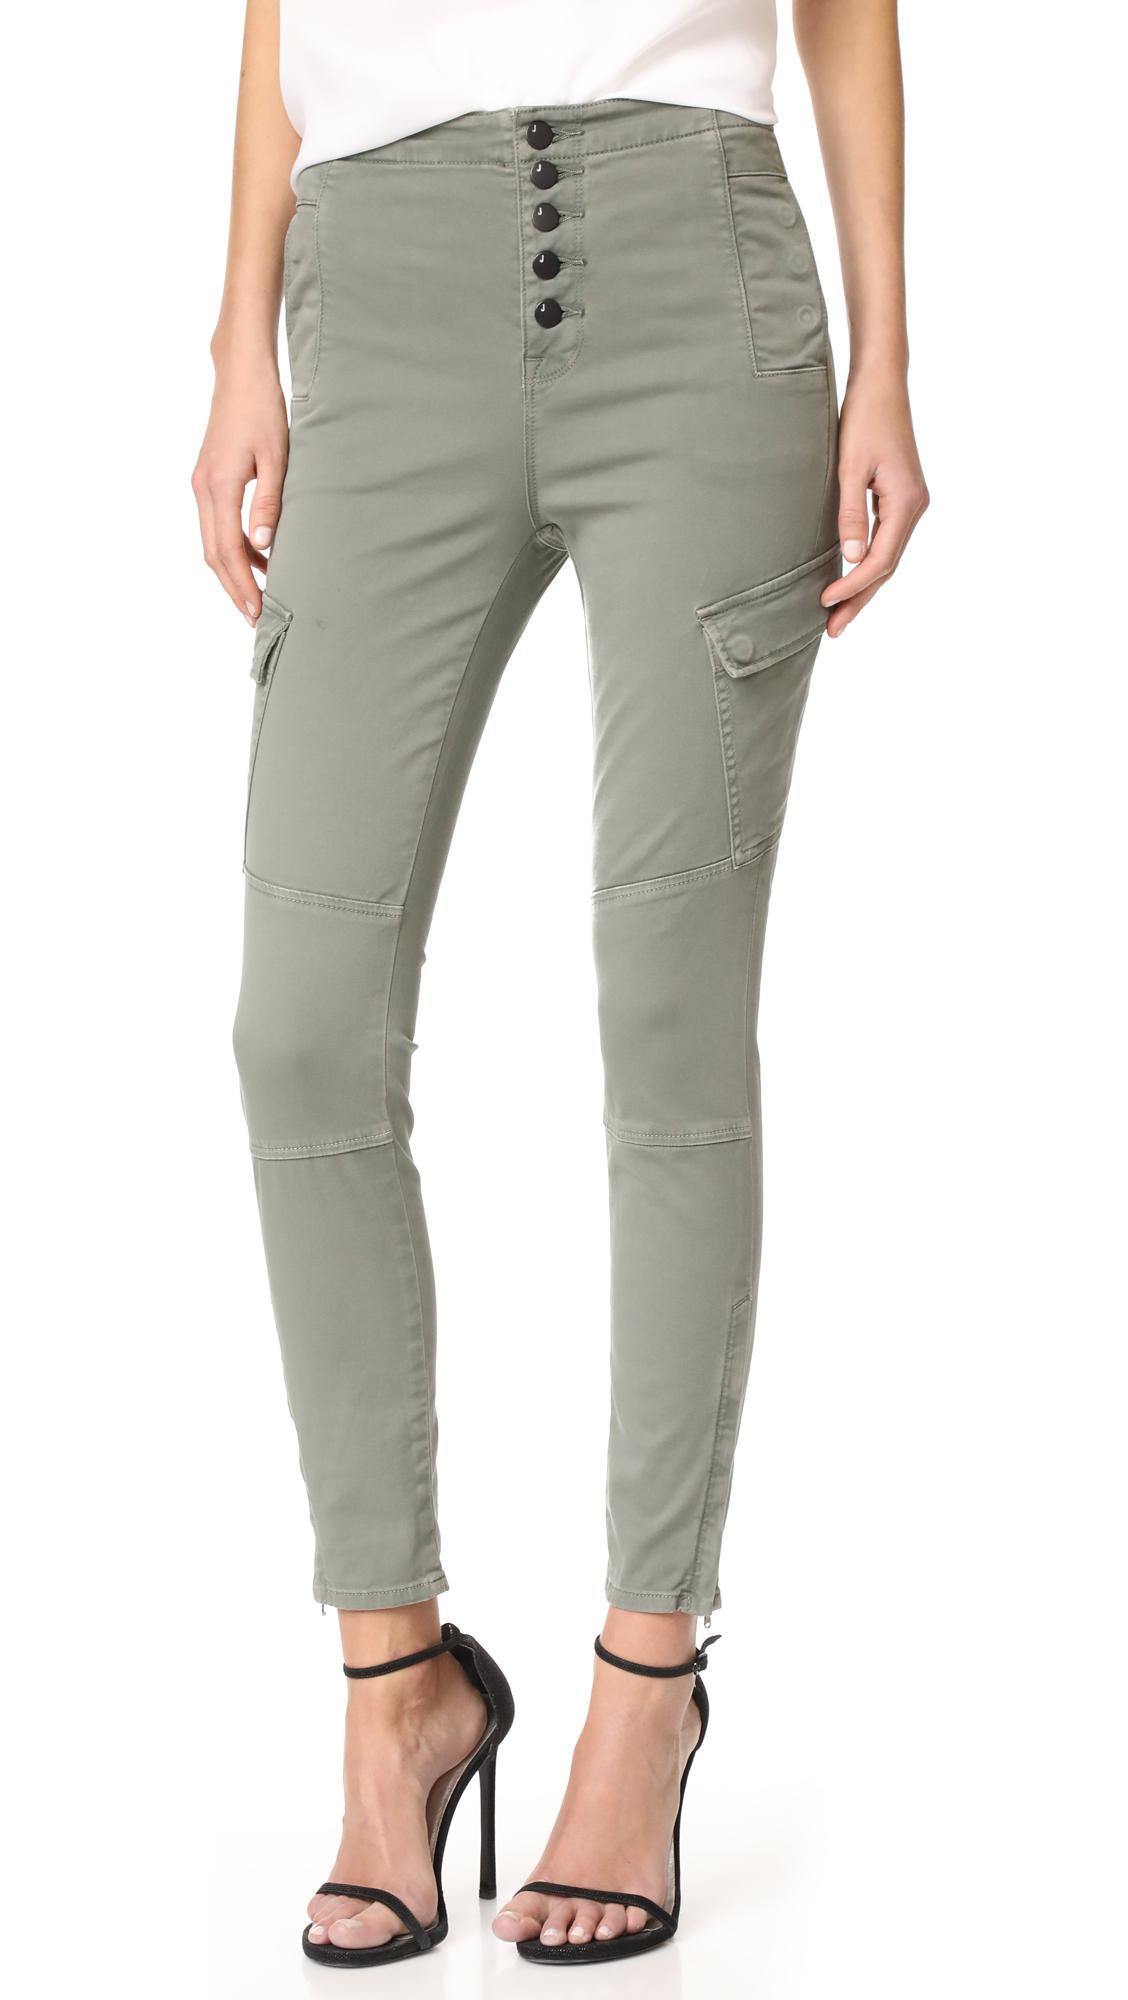 For Sale Footlocker Buy Cheap New Arrival Womens Brigette Sky High Utility Cargo Jeans J Brand mIfjmrBR8